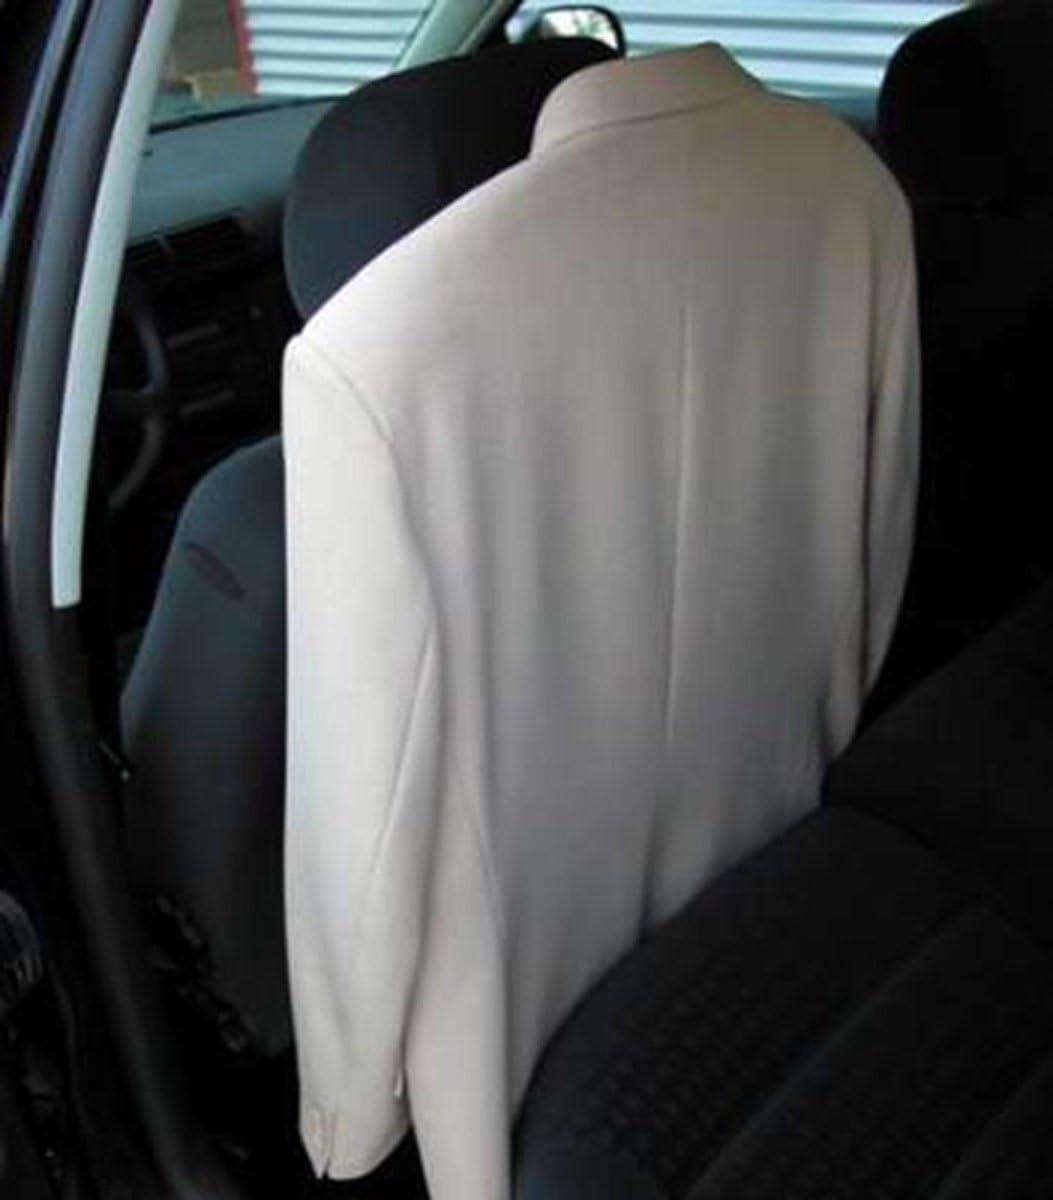 Zento Deals Chrome Car Seat Coat Rack Hanger